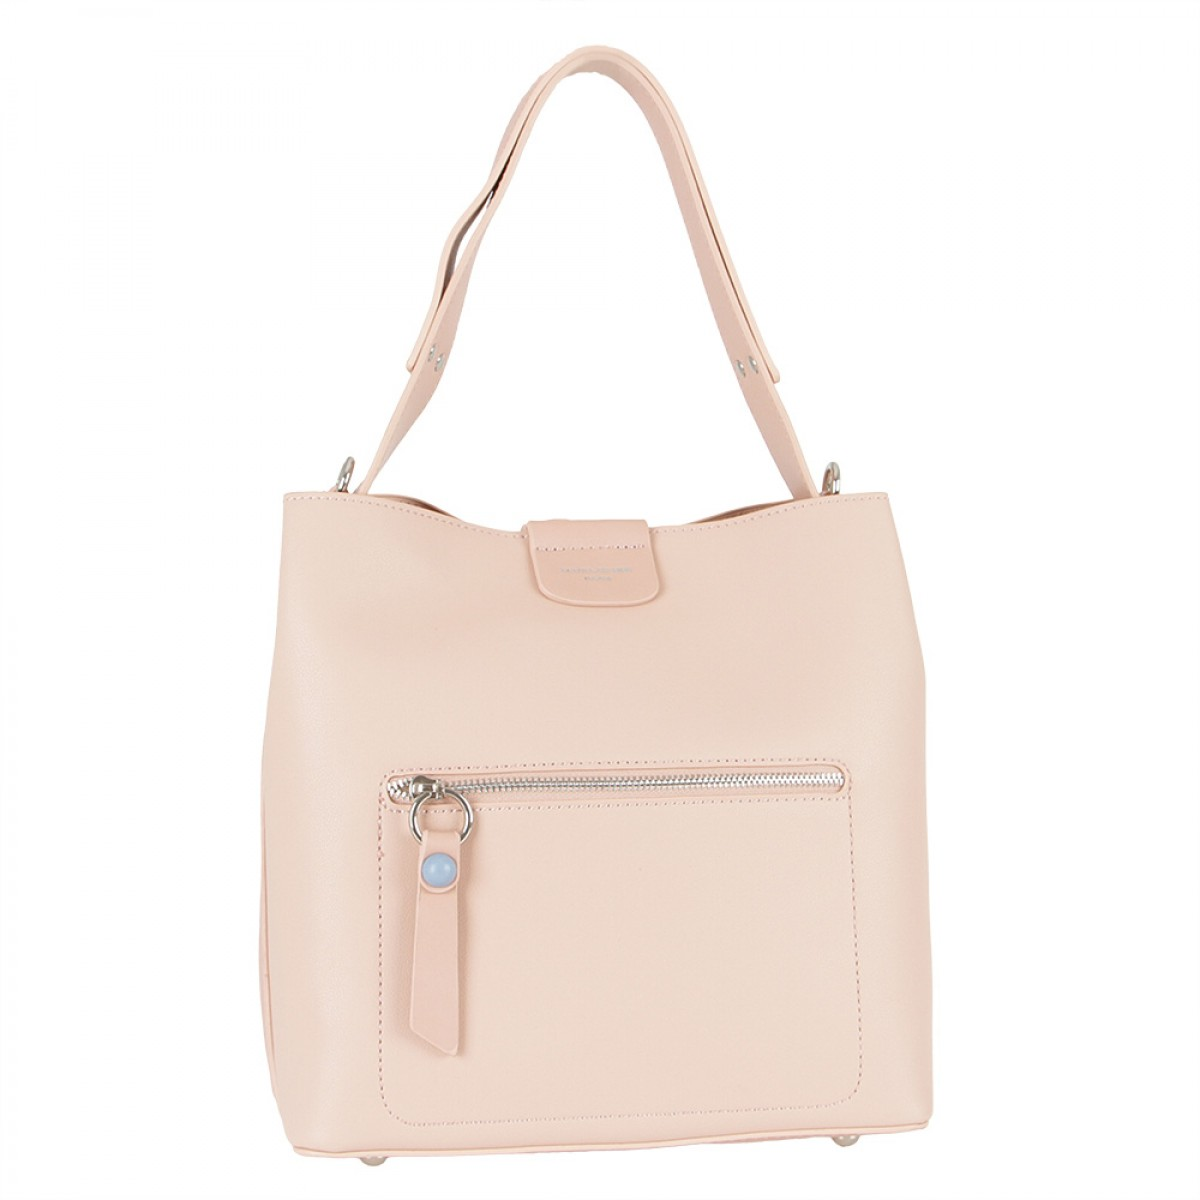 Жіноча сумка David Jones 6216-1 PINK